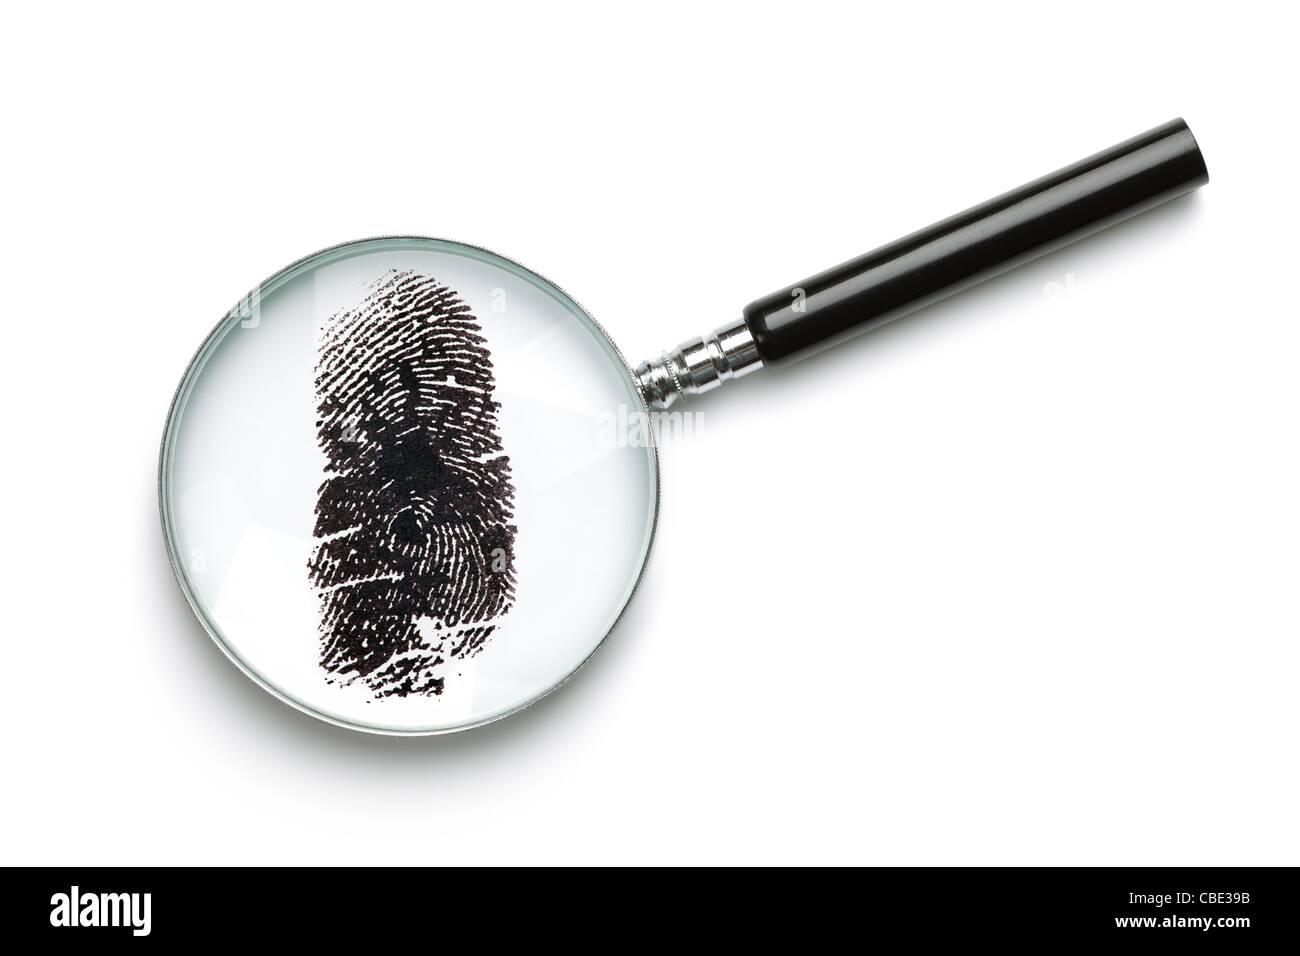 Magnifying glass examining fingerprint - Stock Image